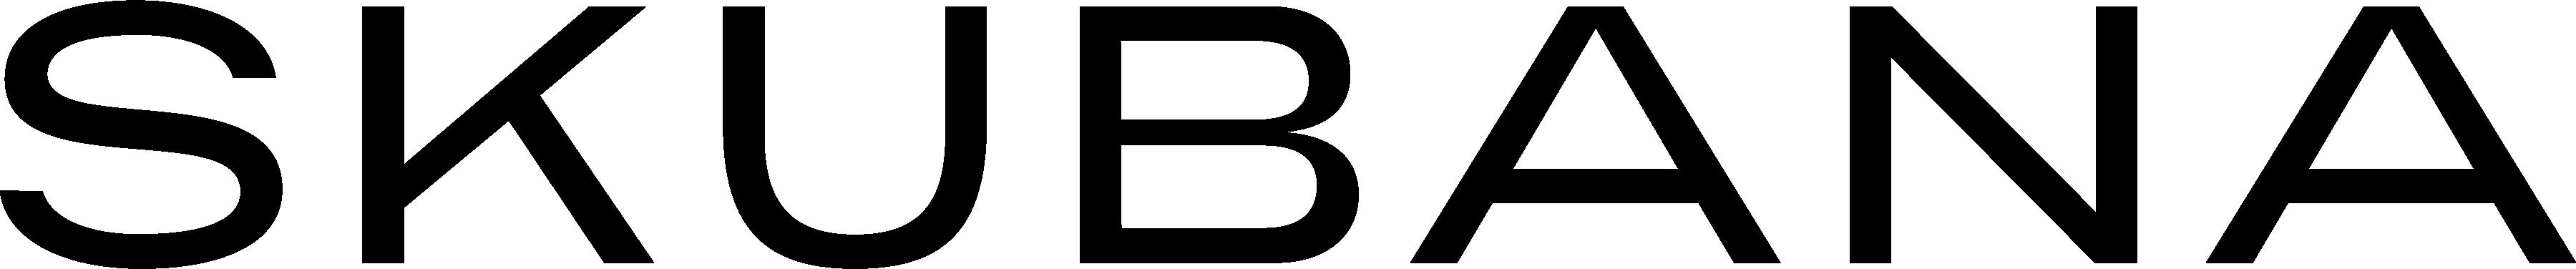 Skuban